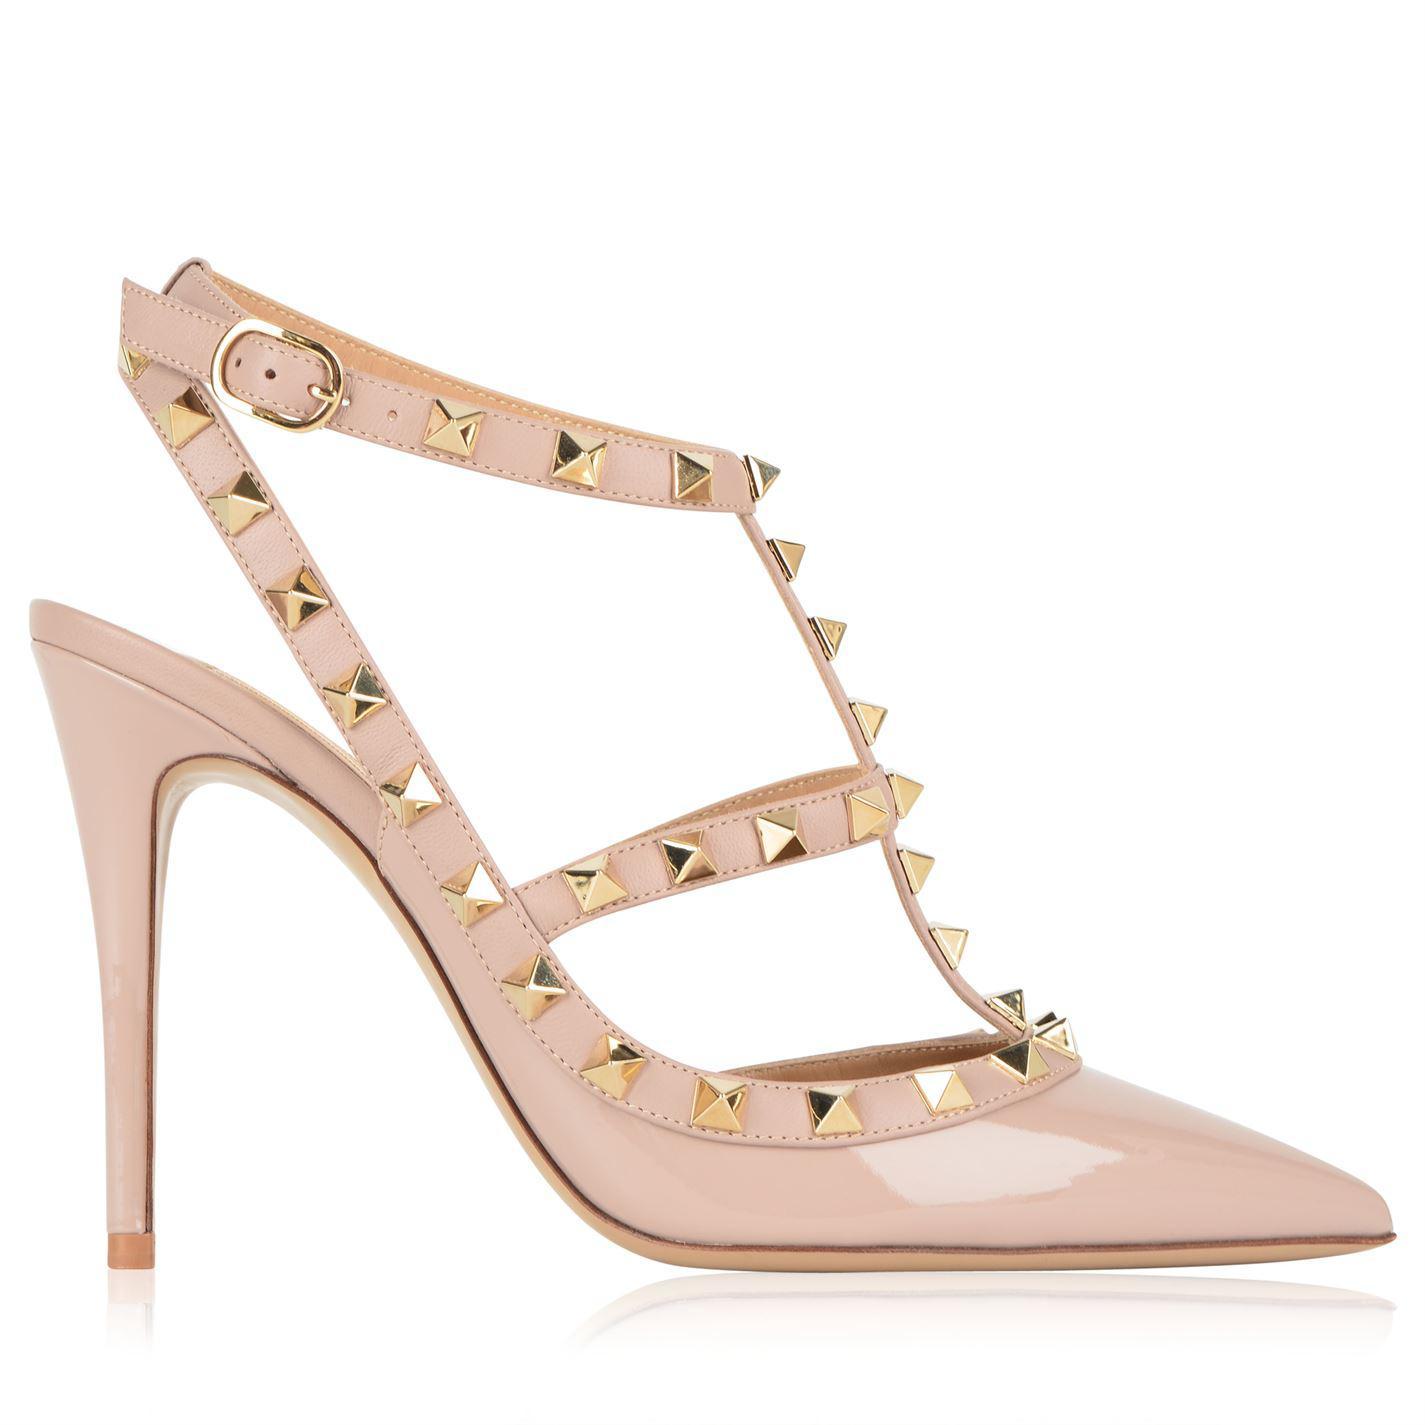 c4c9d446b Valentino. Women s Rockstud 100 Ankle Strap Heels